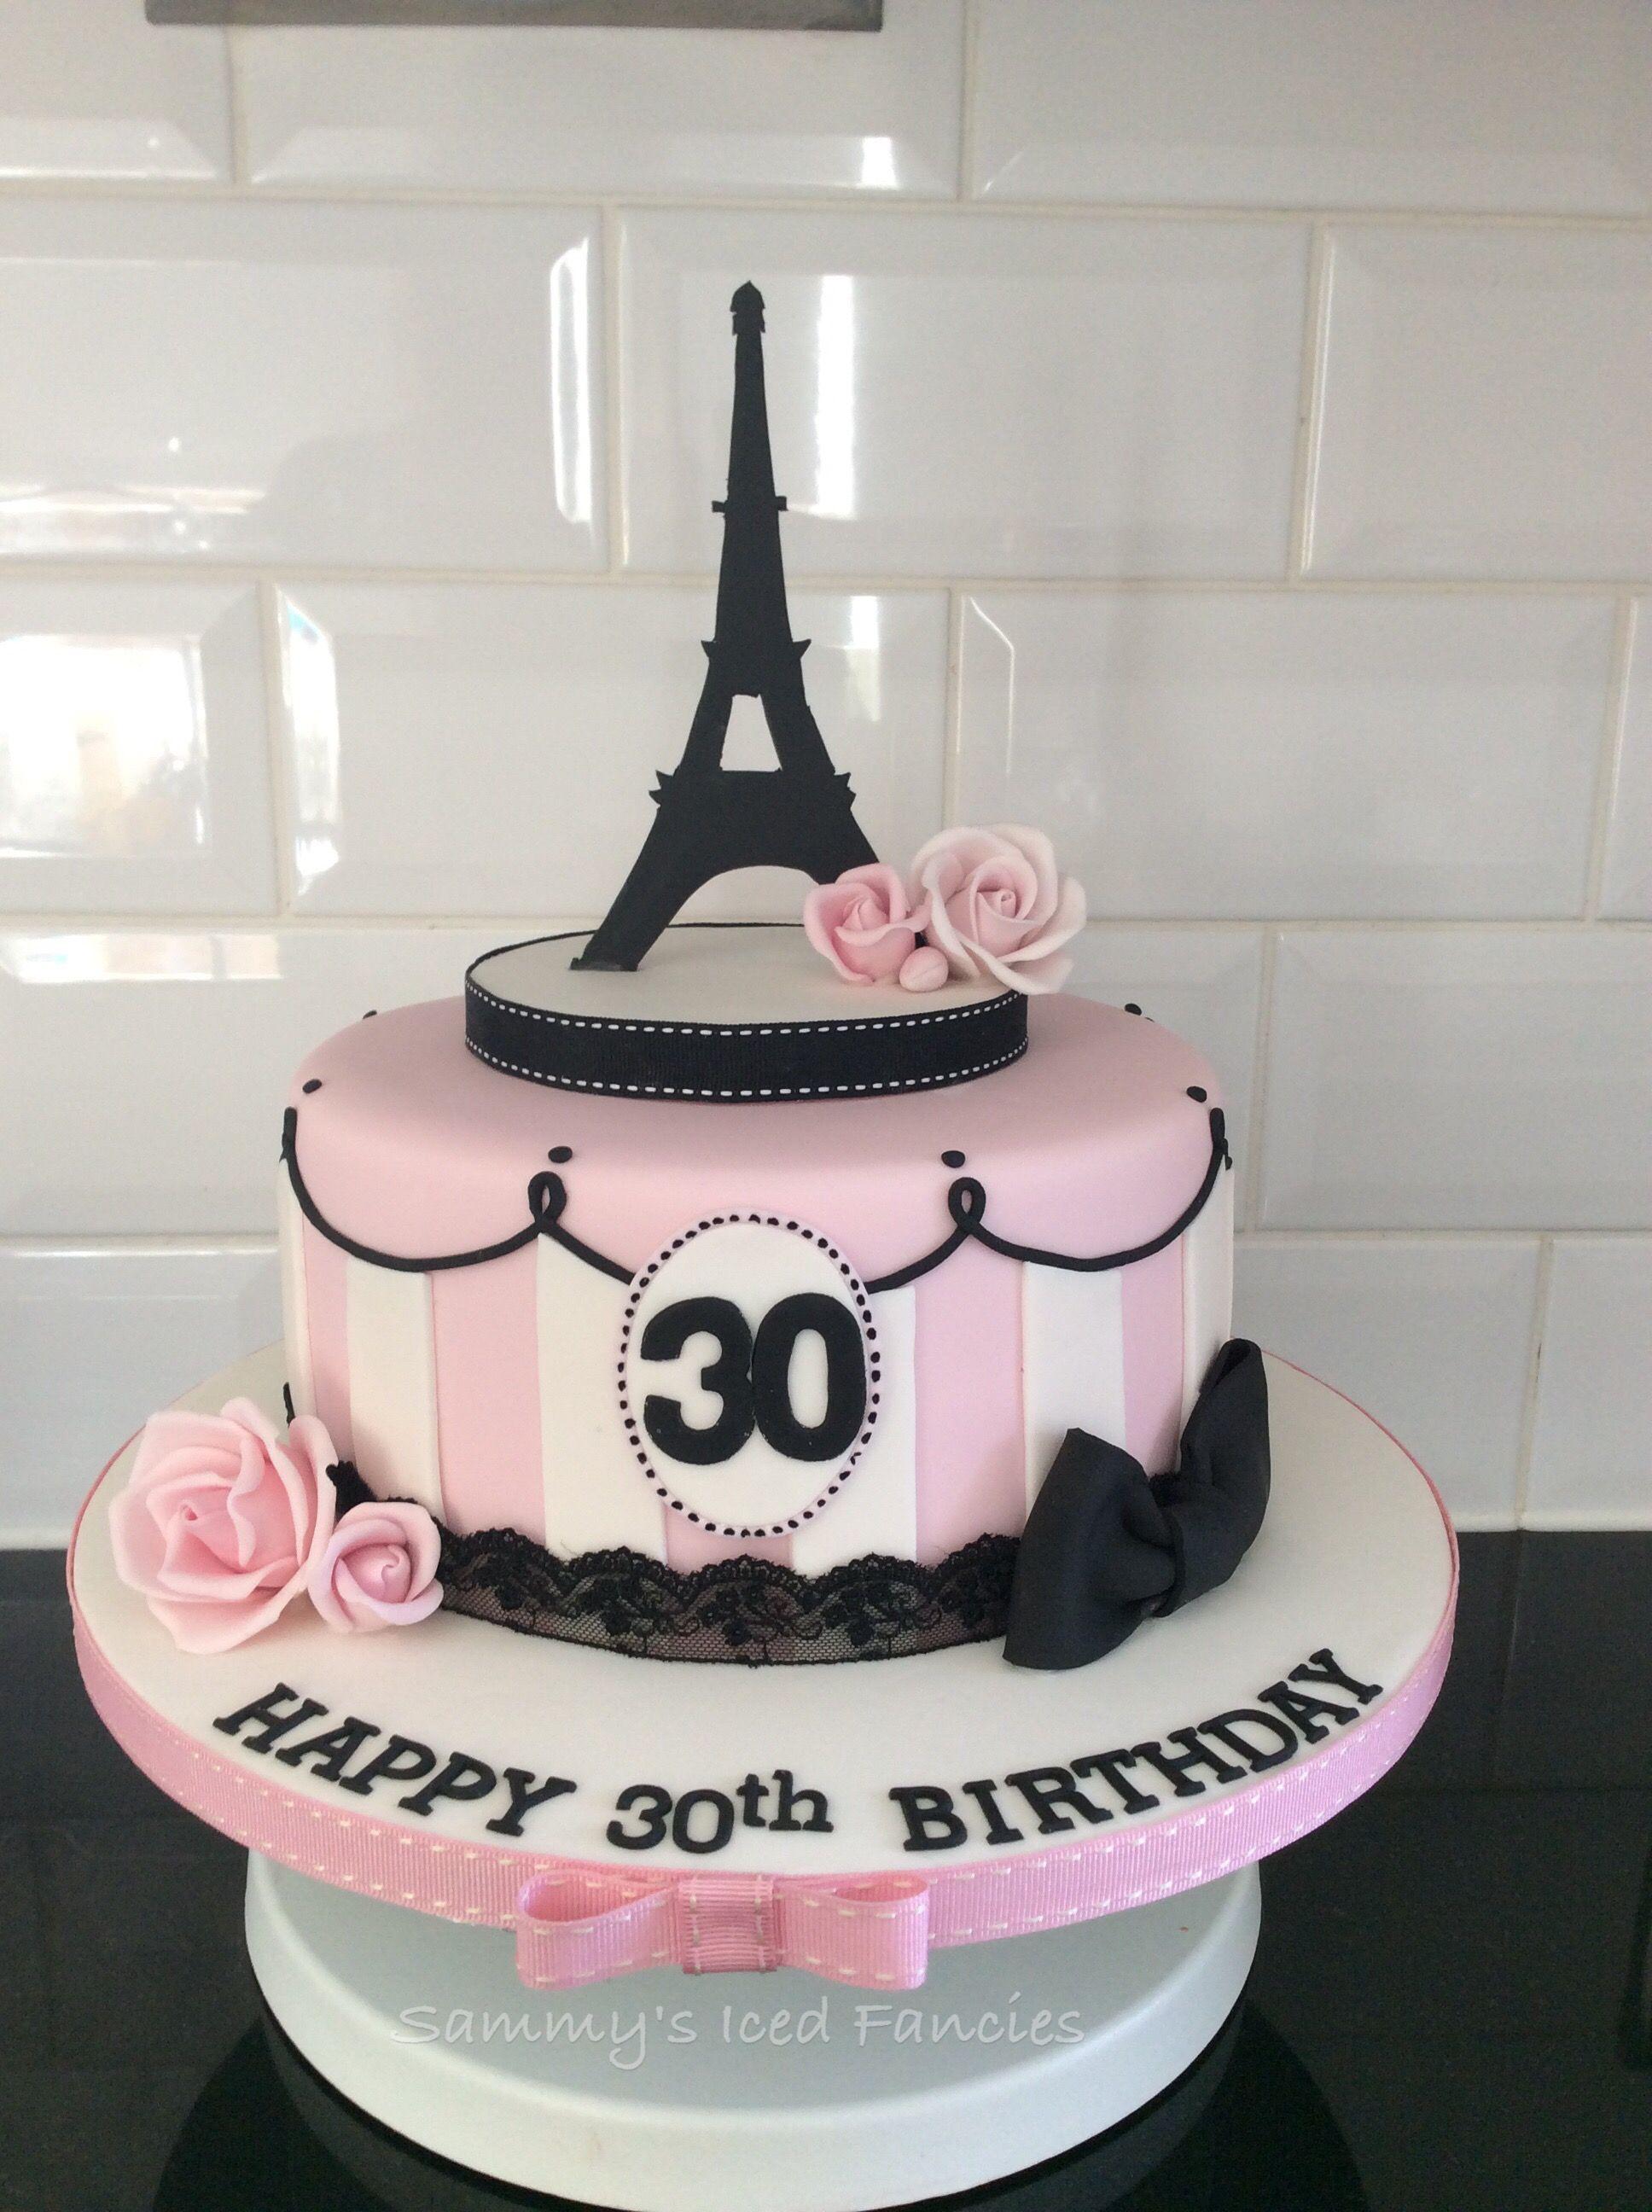 Pleasant Paris Themed 30Th Birthday Cake Paris Cakes Paris Themed Cakes Funny Birthday Cards Online Alyptdamsfinfo